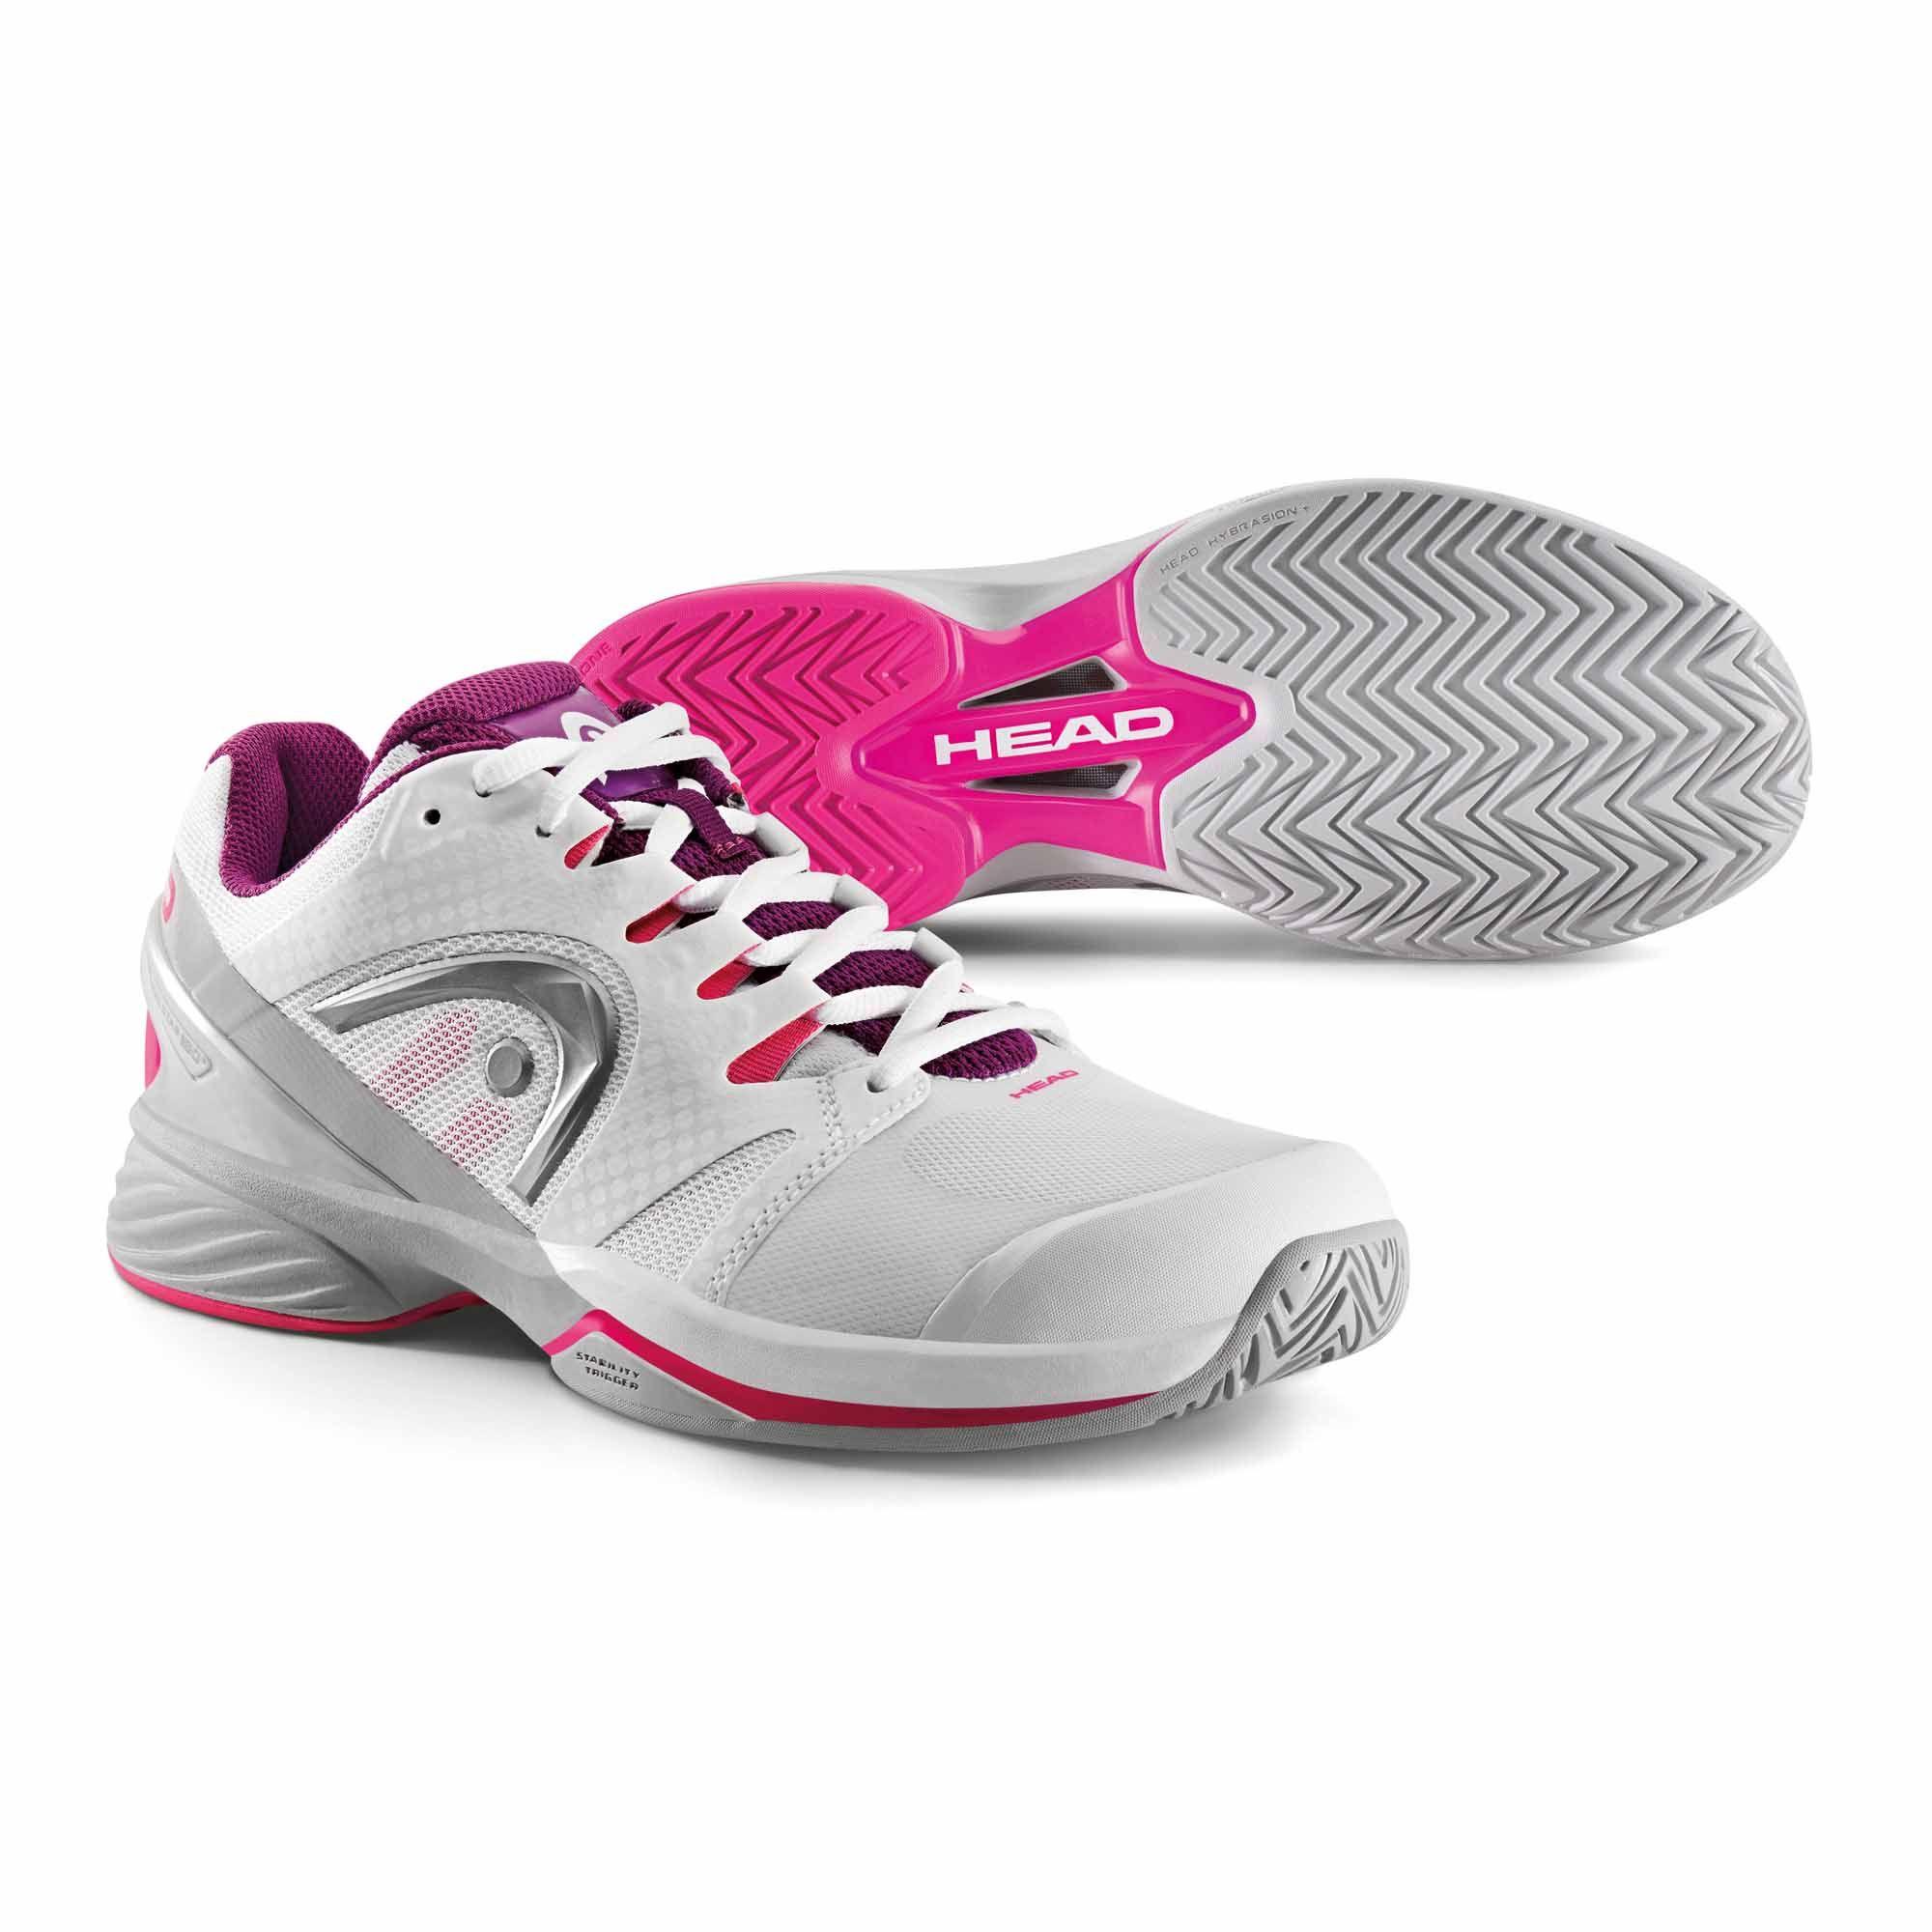 nitro pro tennis shoes